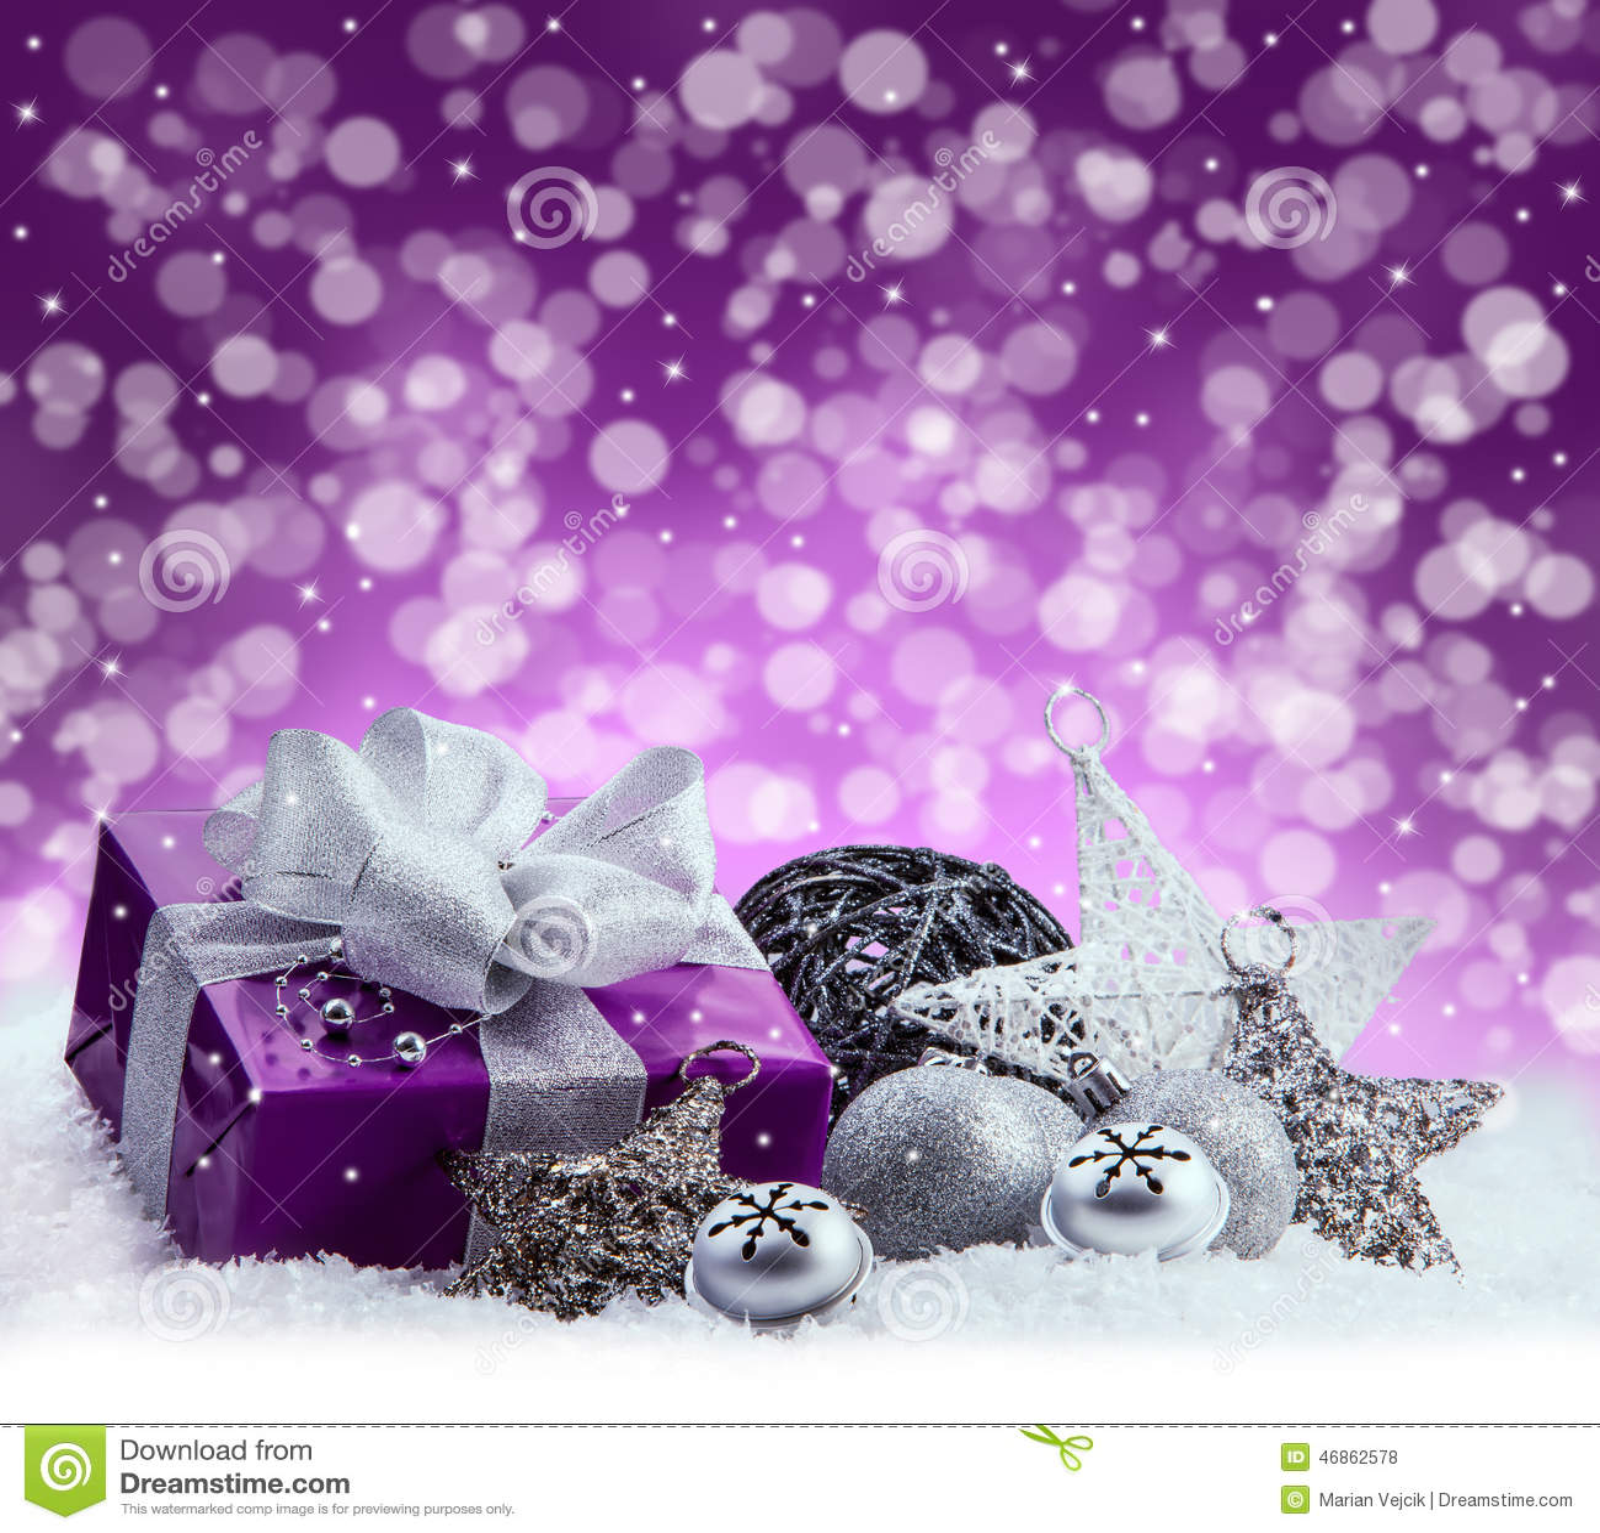 Christmas Purple.Purple Christmas Package Gift Of A Silver Ribbon Jingle